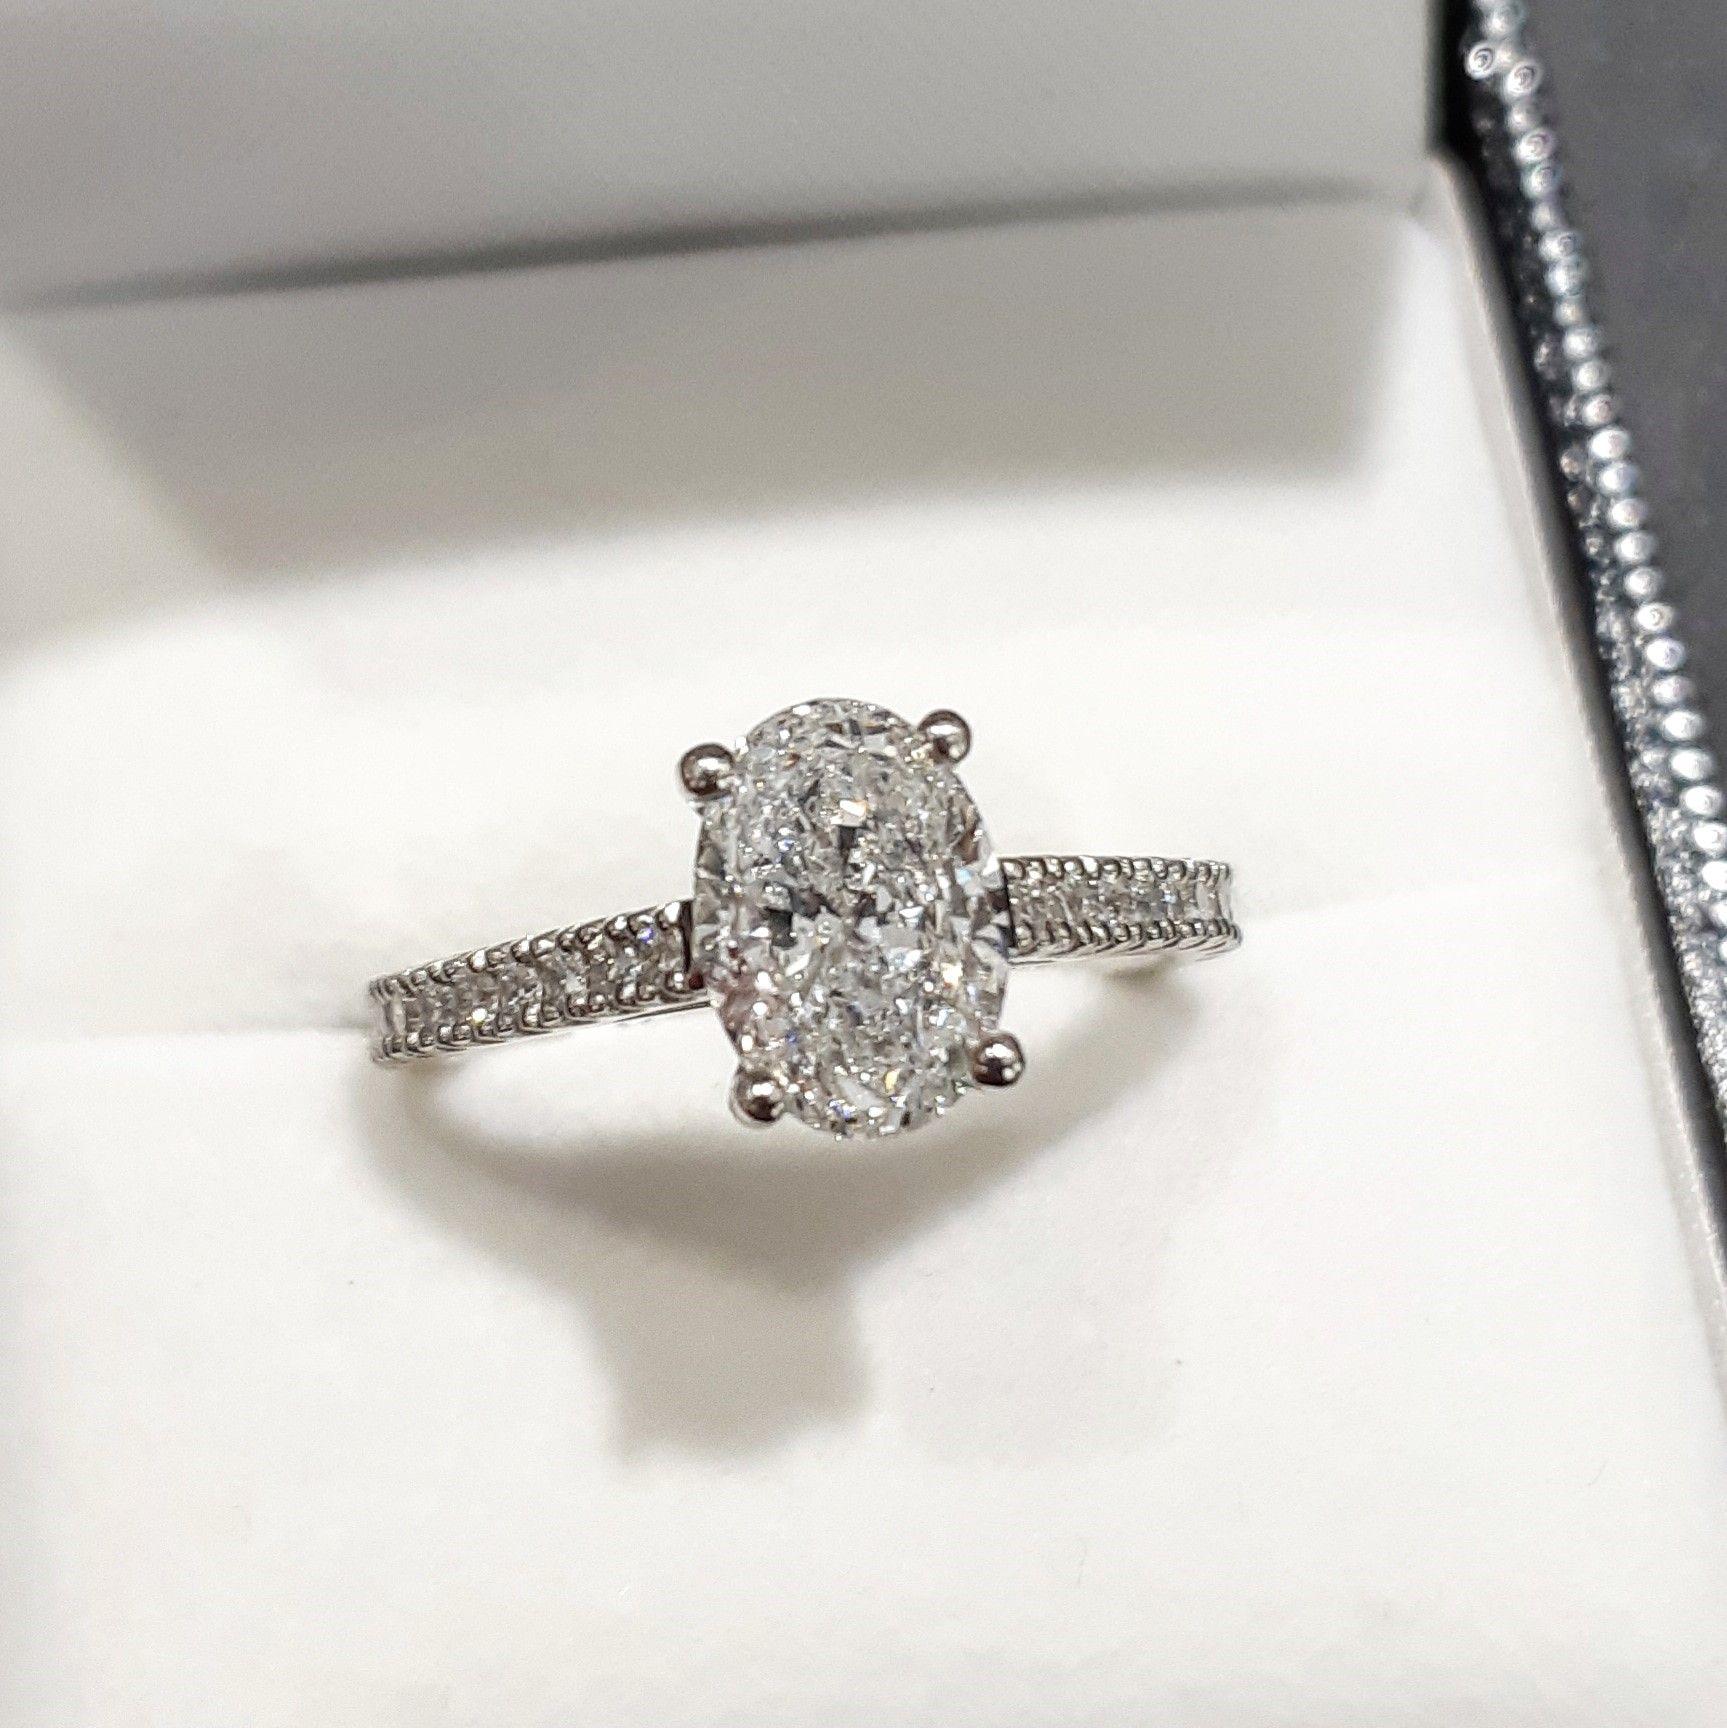 df723ab9f5c7b 1.74ct oval cut diamond engagment ring with claw set diamond ...